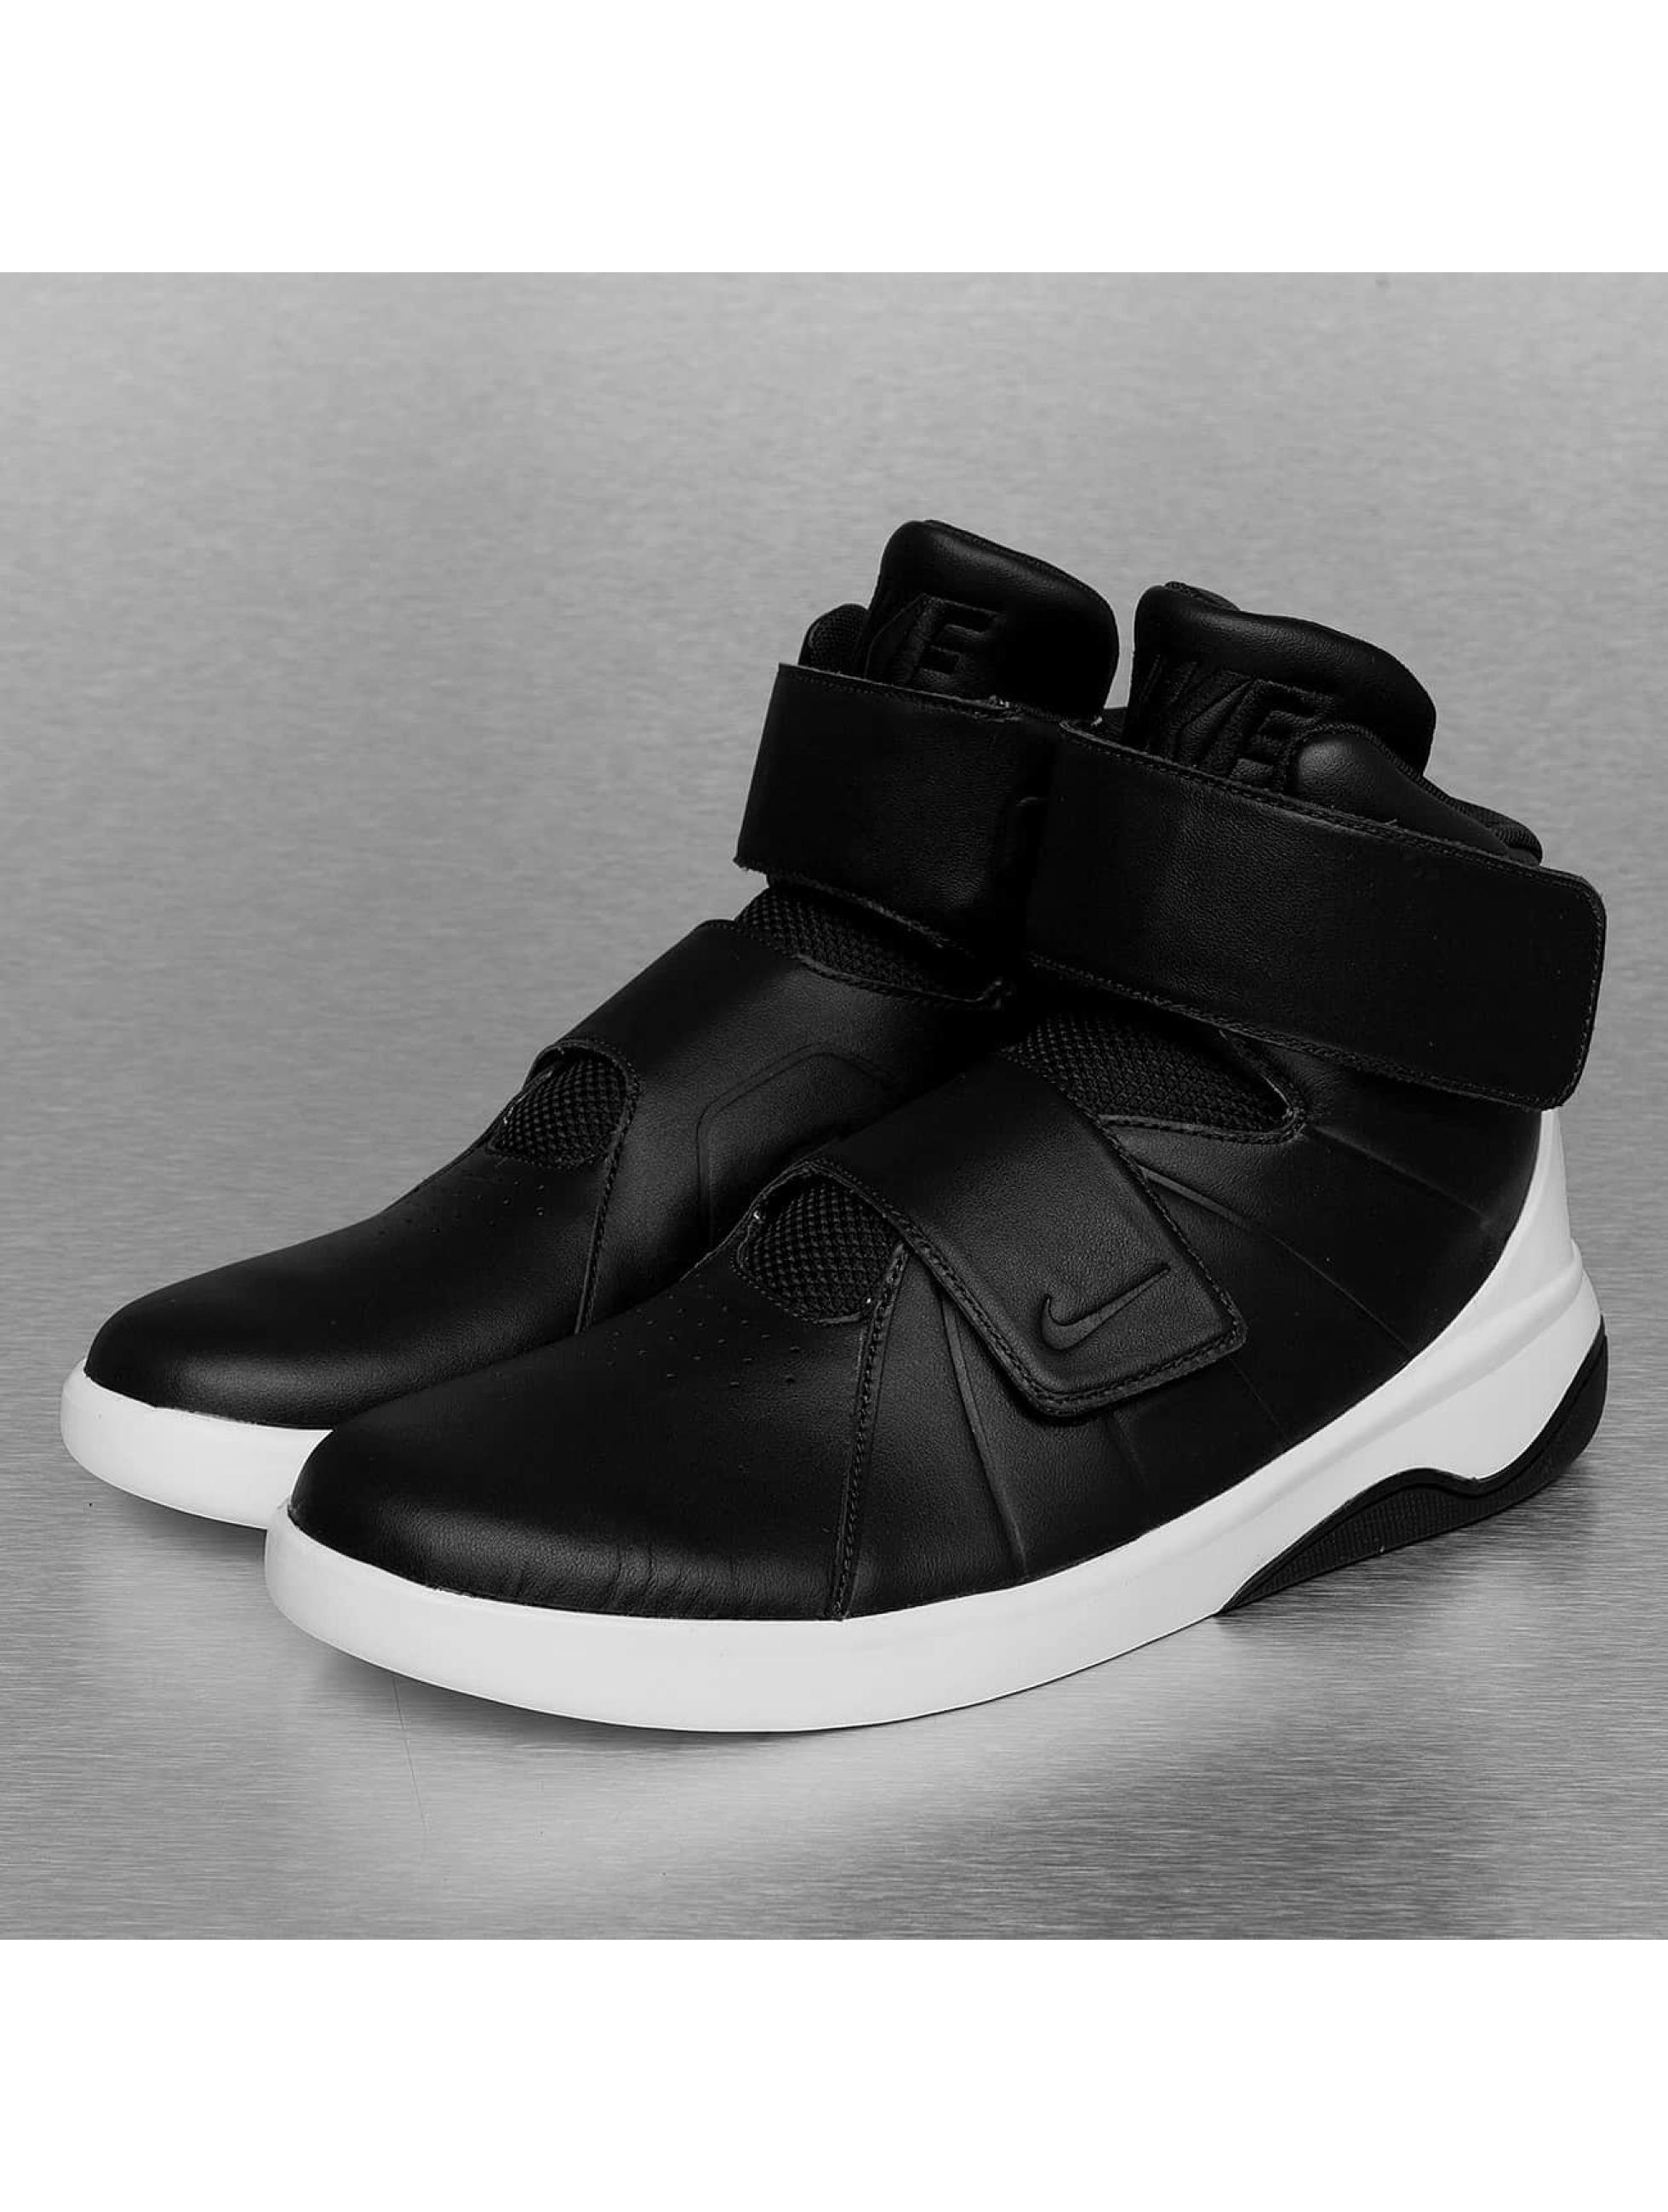 Nike Sneakers Schwarz